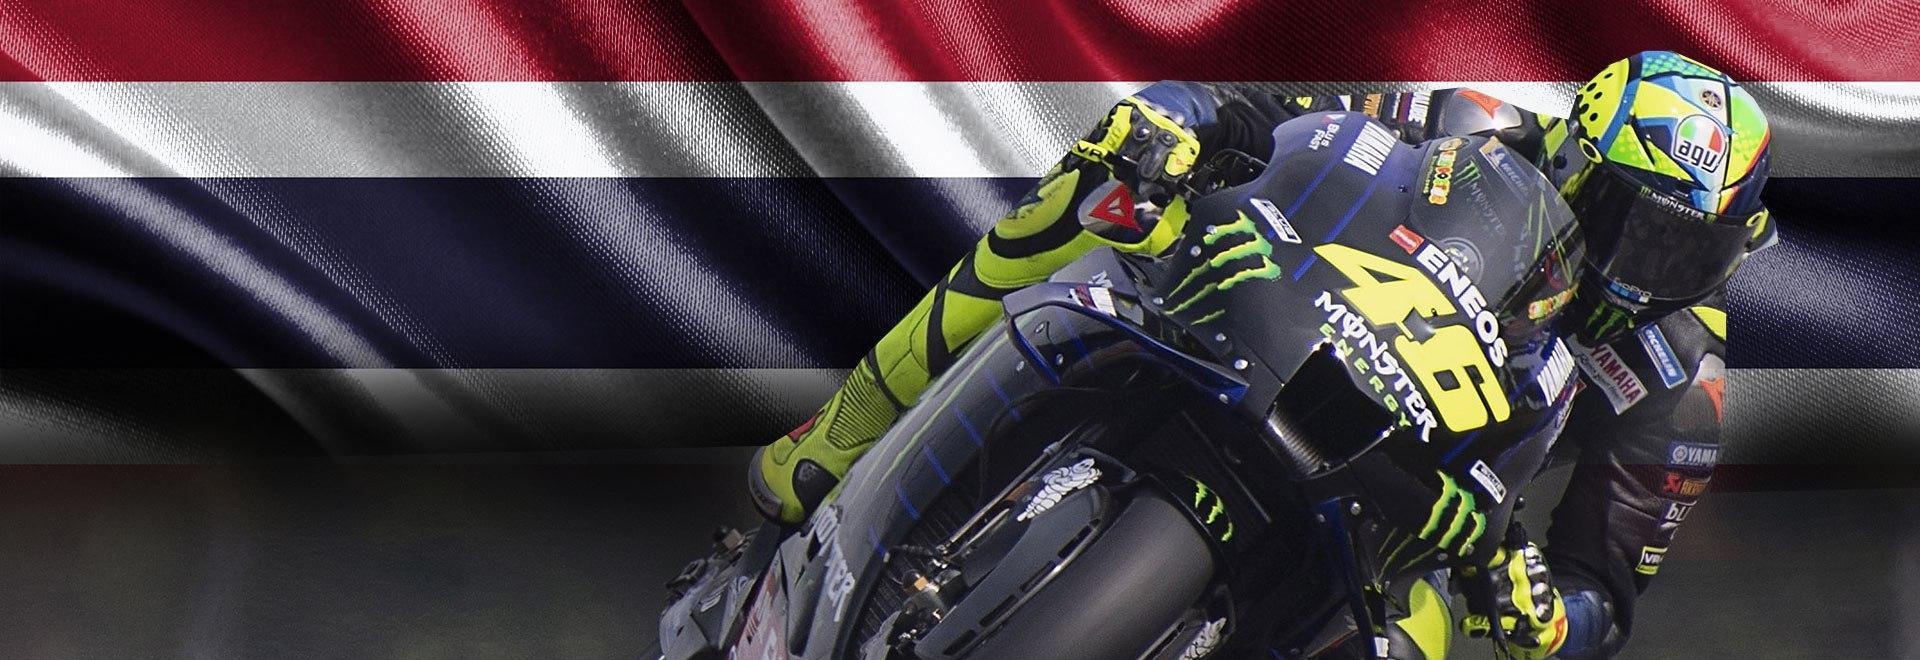 GP Thailandia. Qualifiche